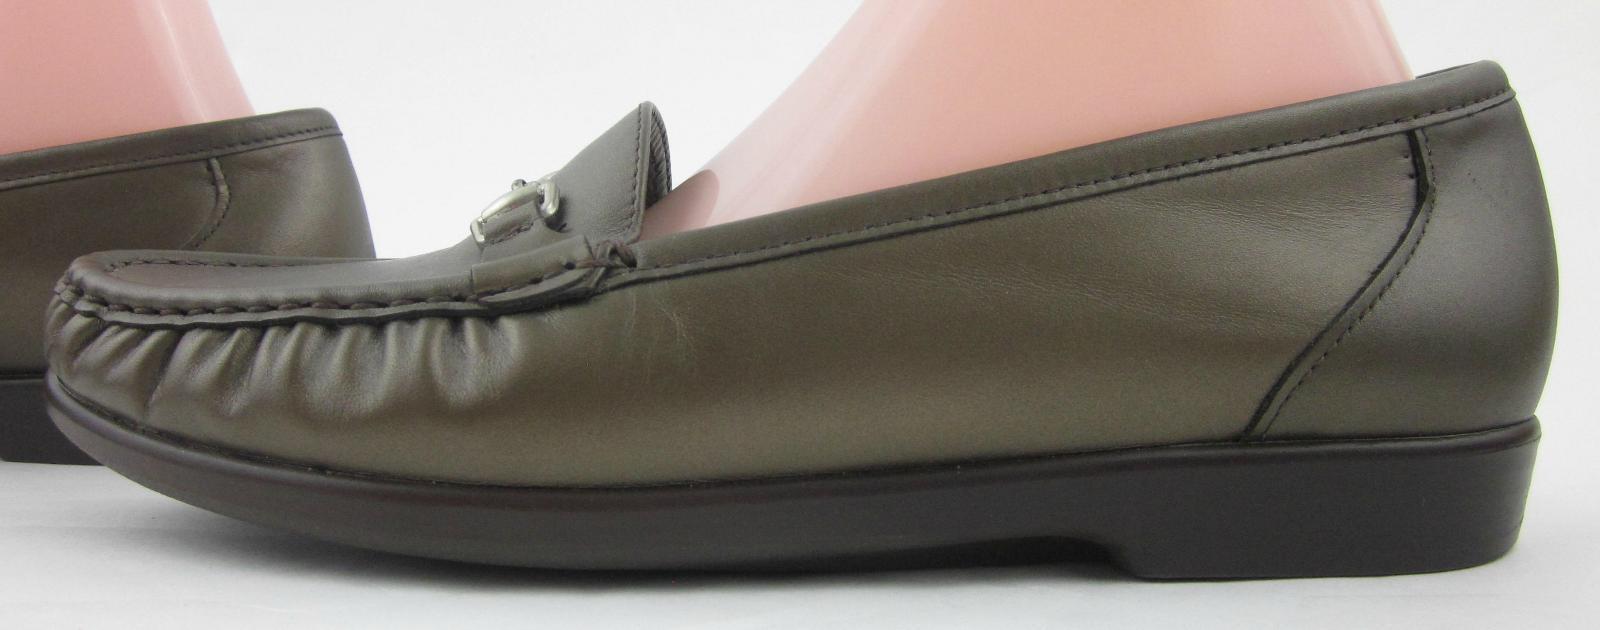 New    SAS Metro Slip On Comfort Loafers Bronze Leather US 10M f348d3